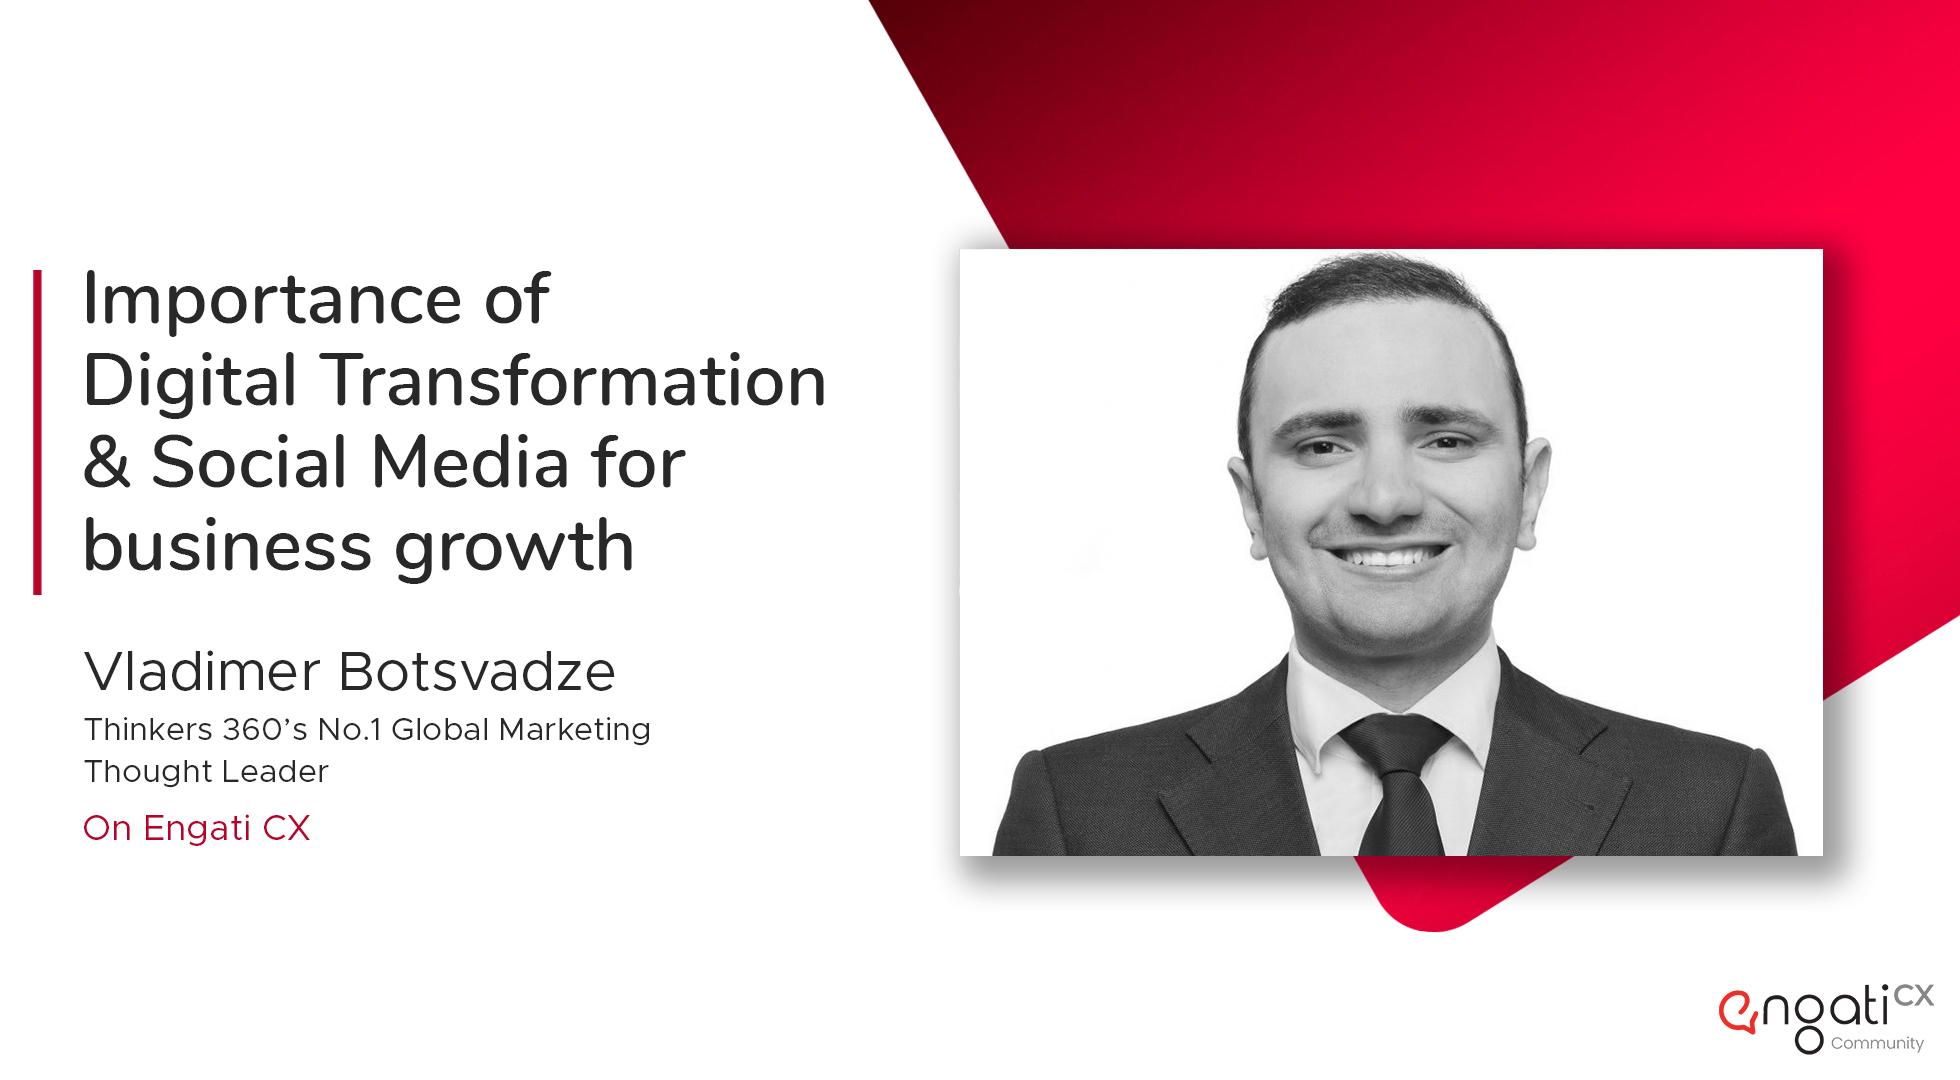 Digital transformation | Vladimer Botsvadze | Engati CX